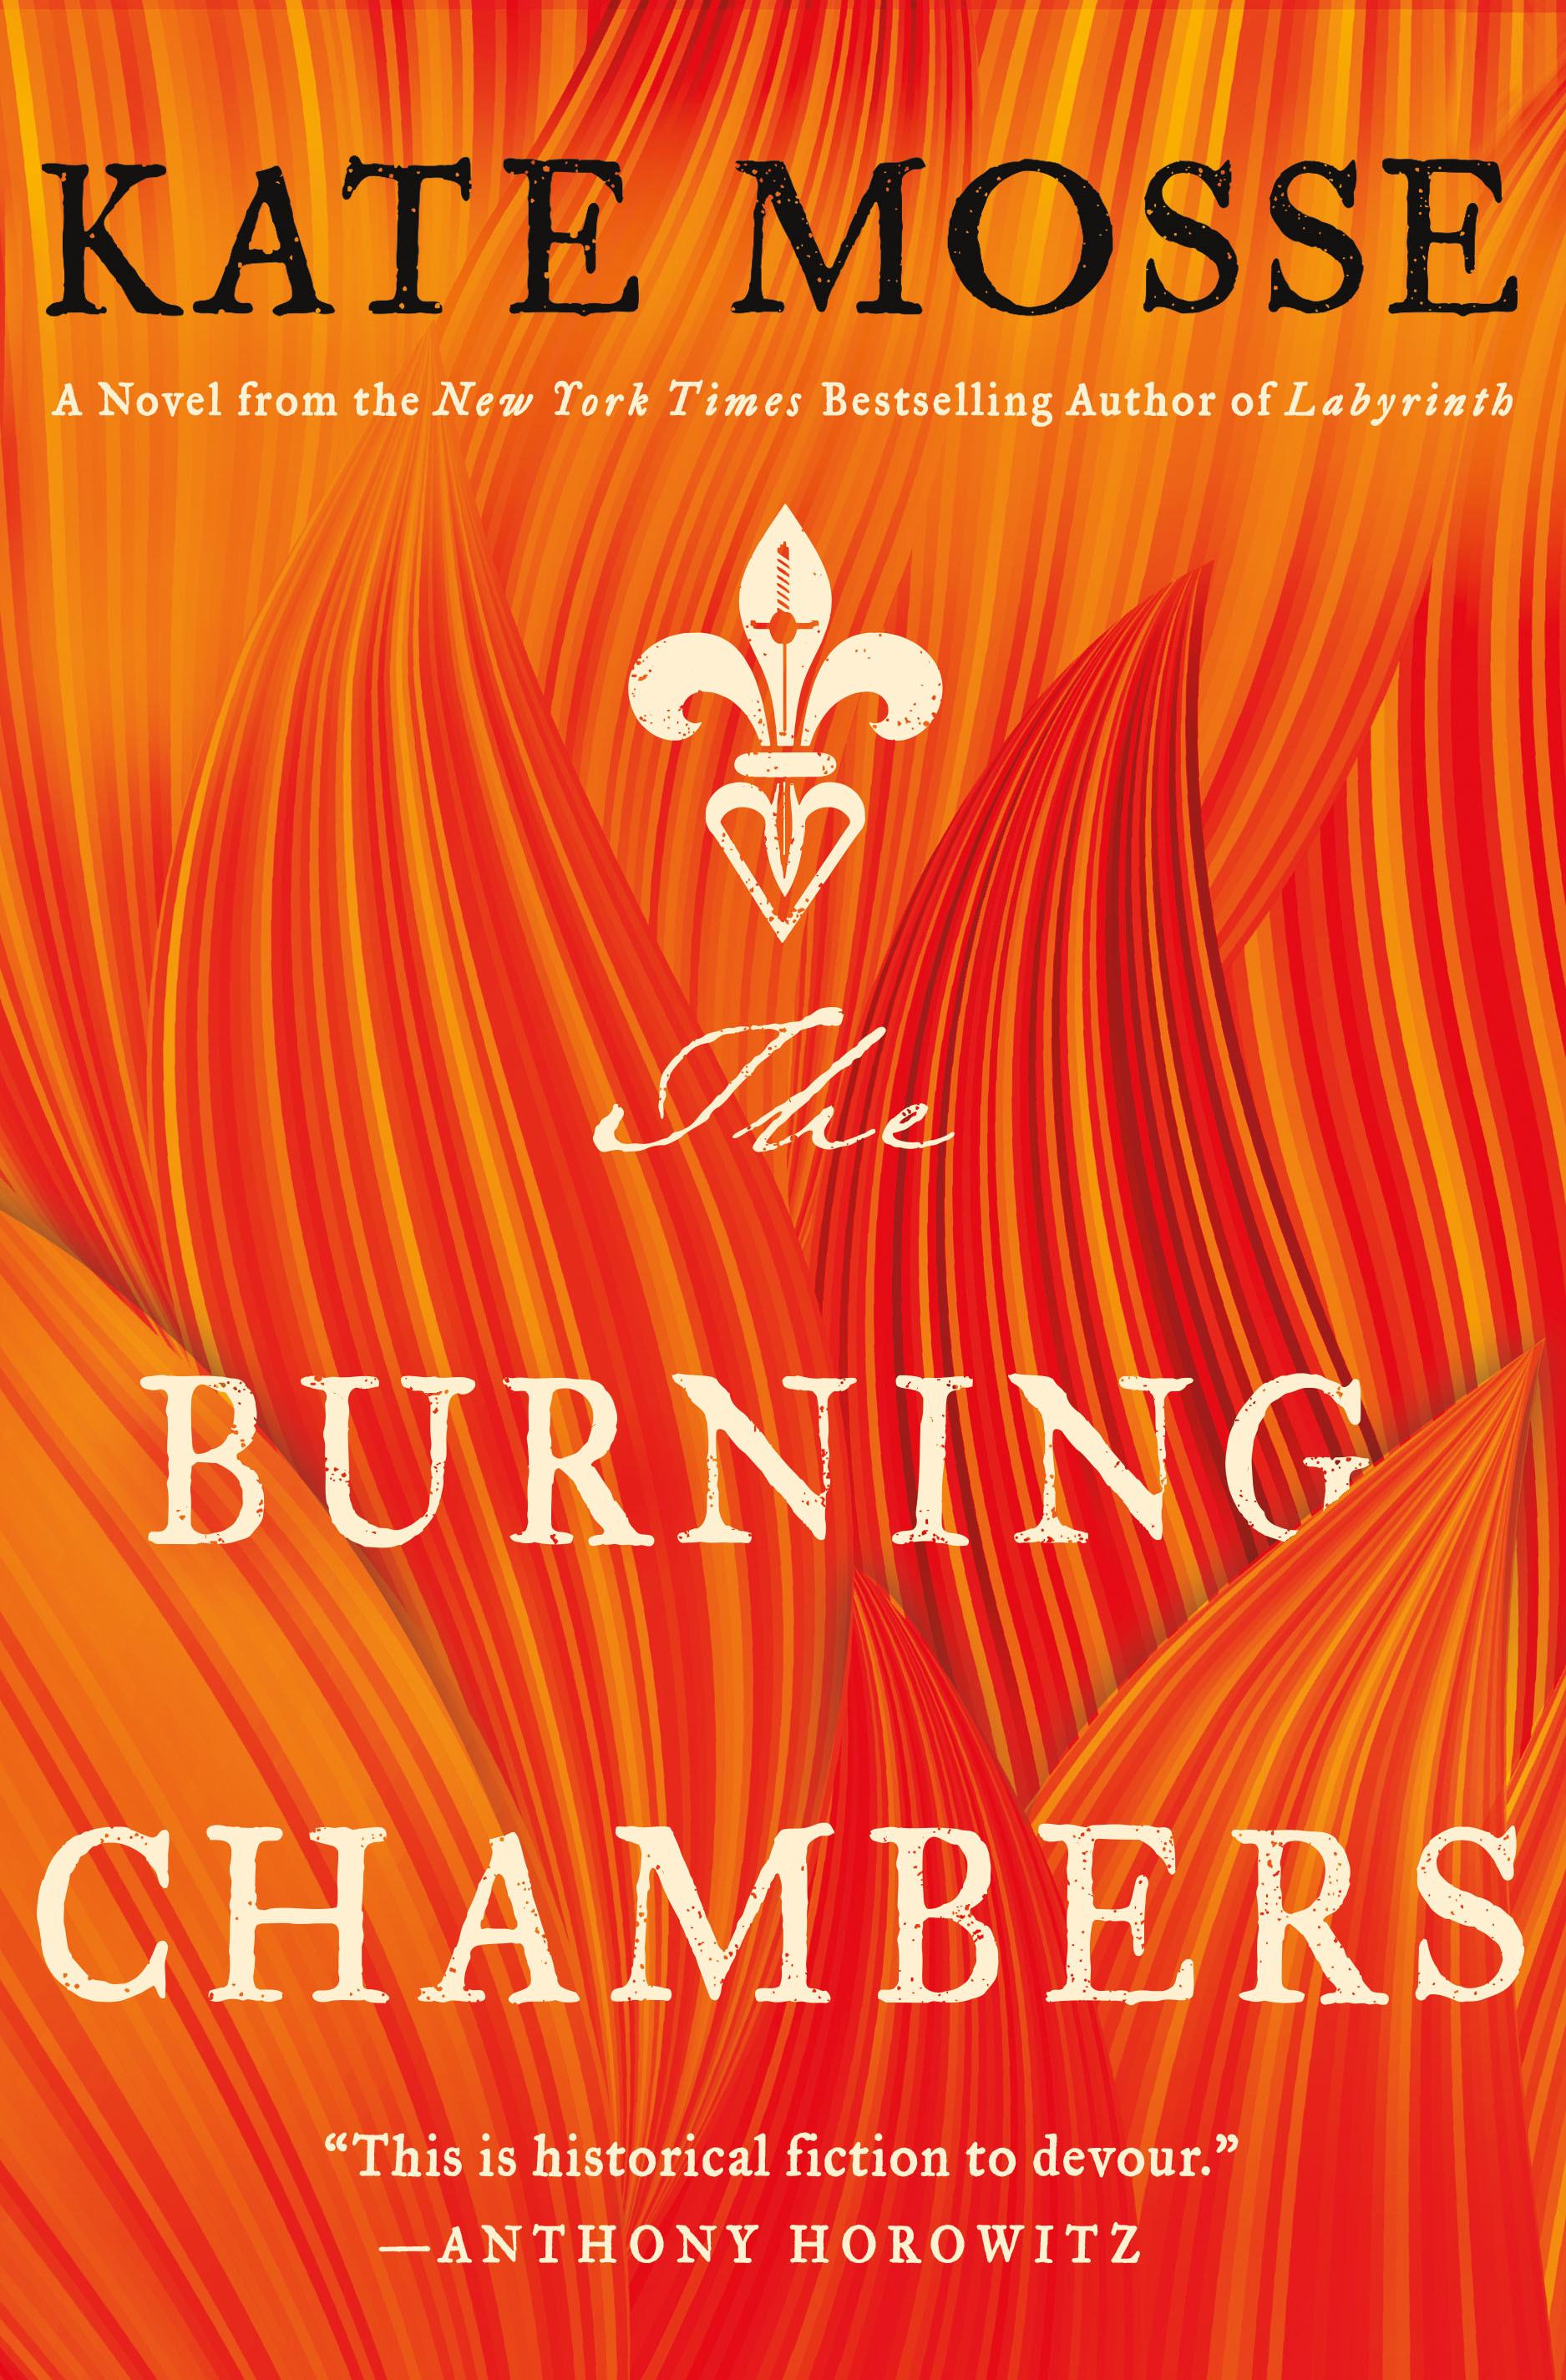 The Burning Chambers: A Novel